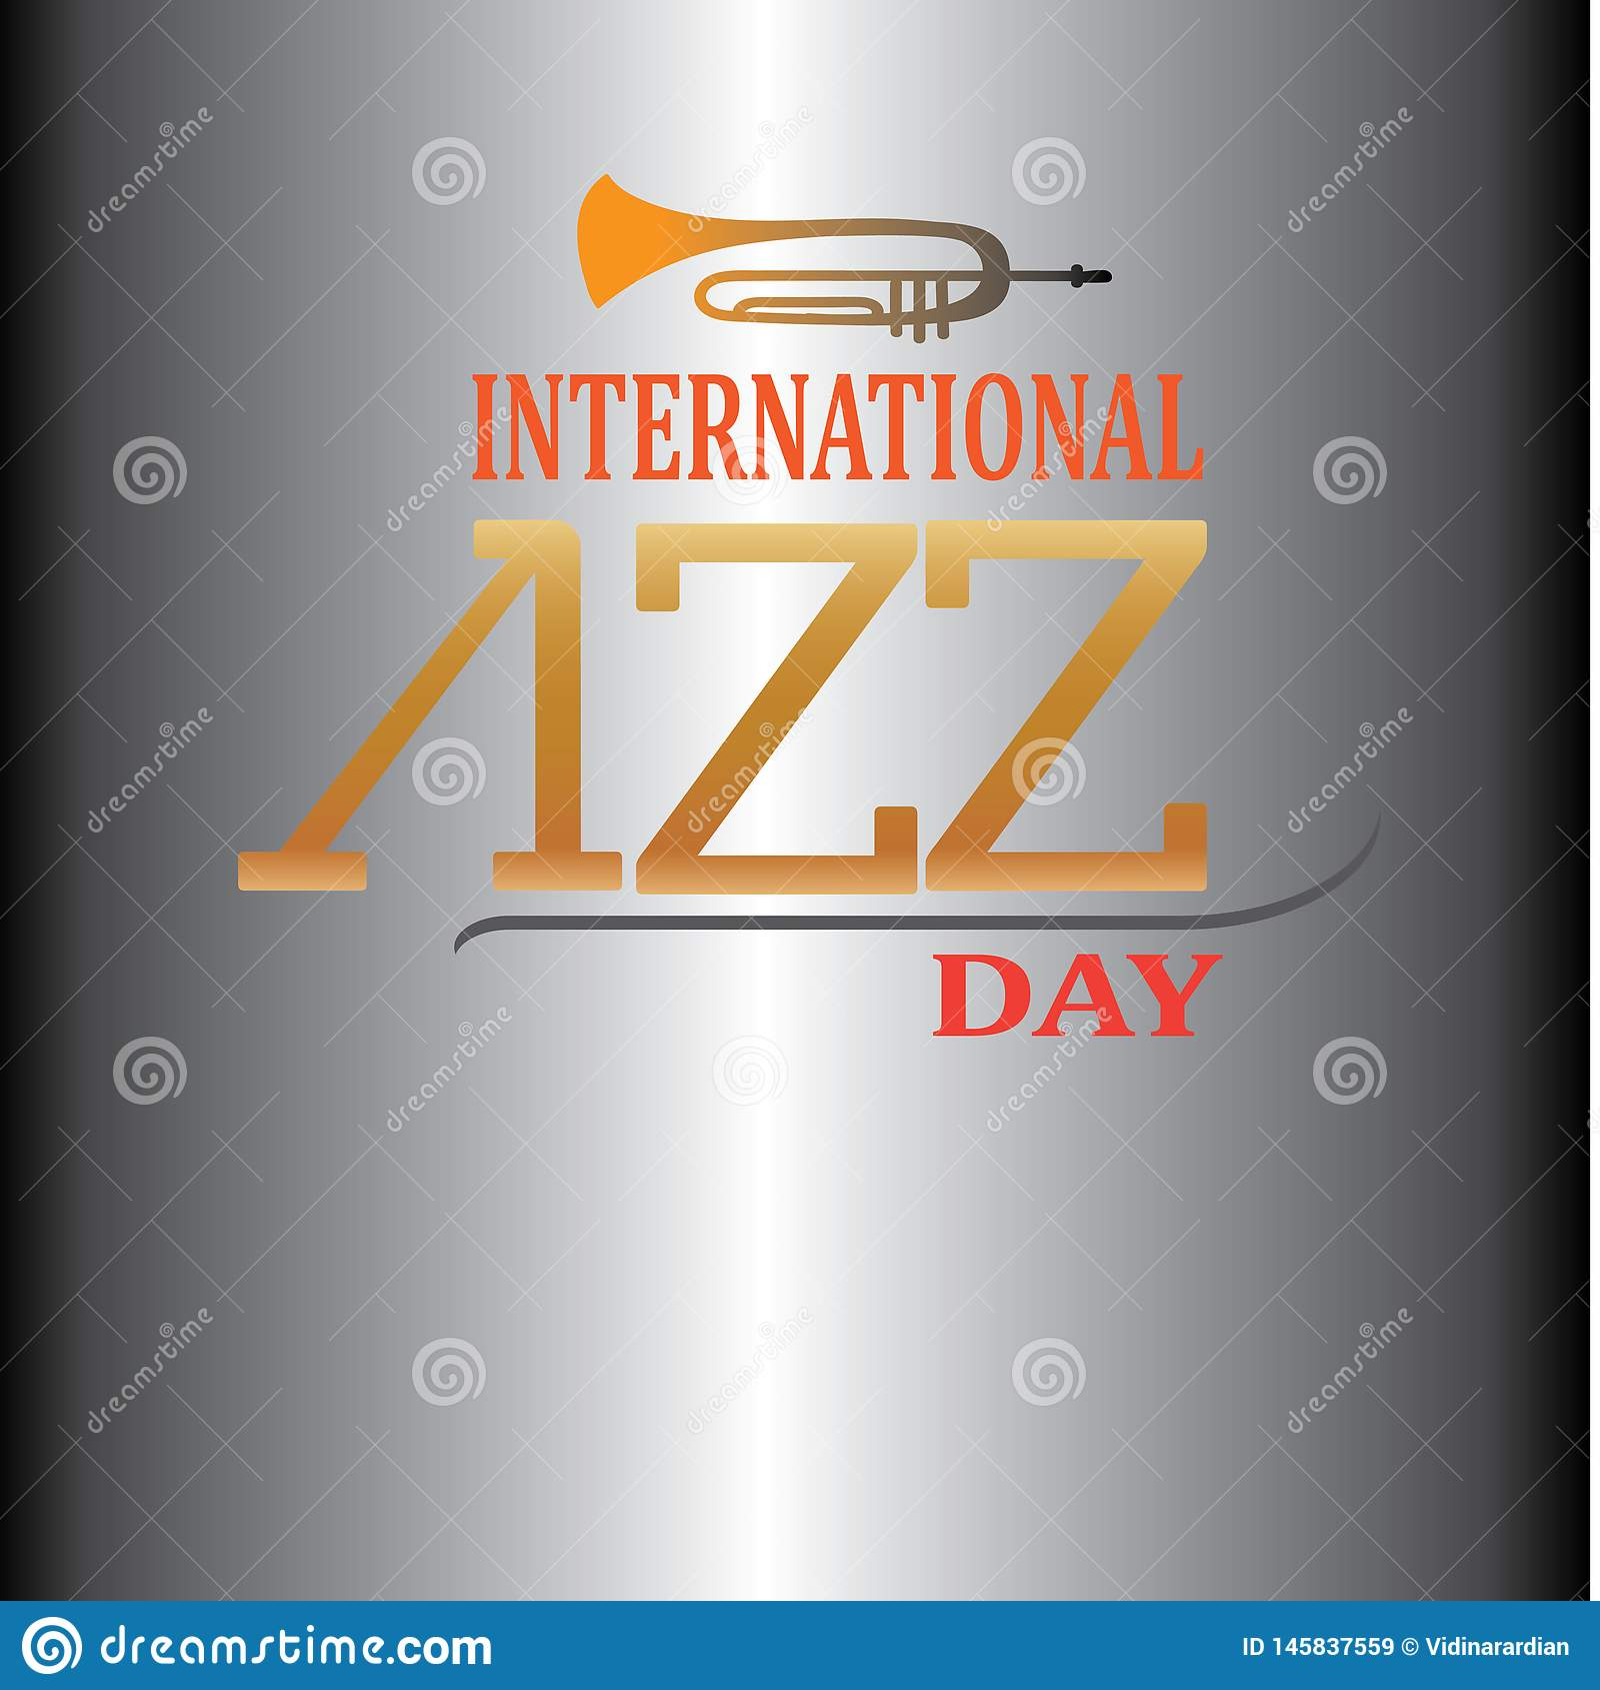 Internationaler Jazz Day Vector Illustrations-Entwurf - Datei des Vektor